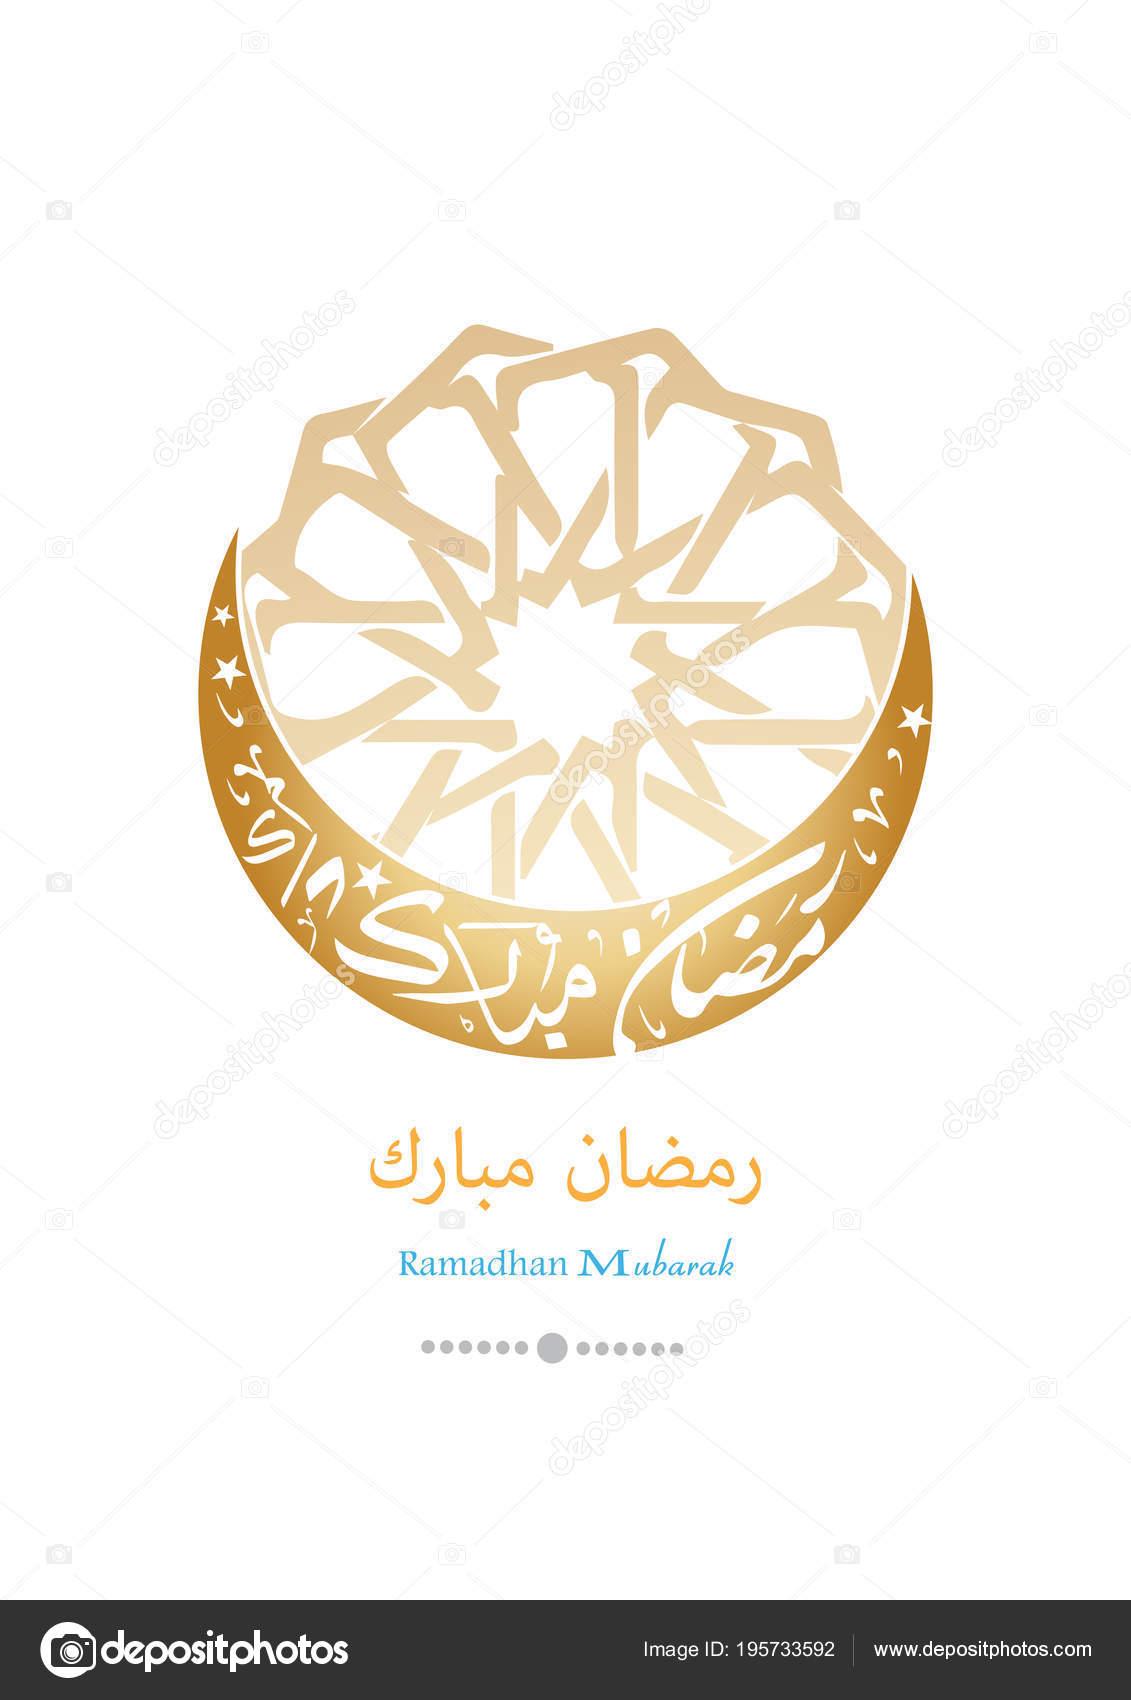 Ramadan Kareem Greeting Cards Arabic Calligraphy Style Translation